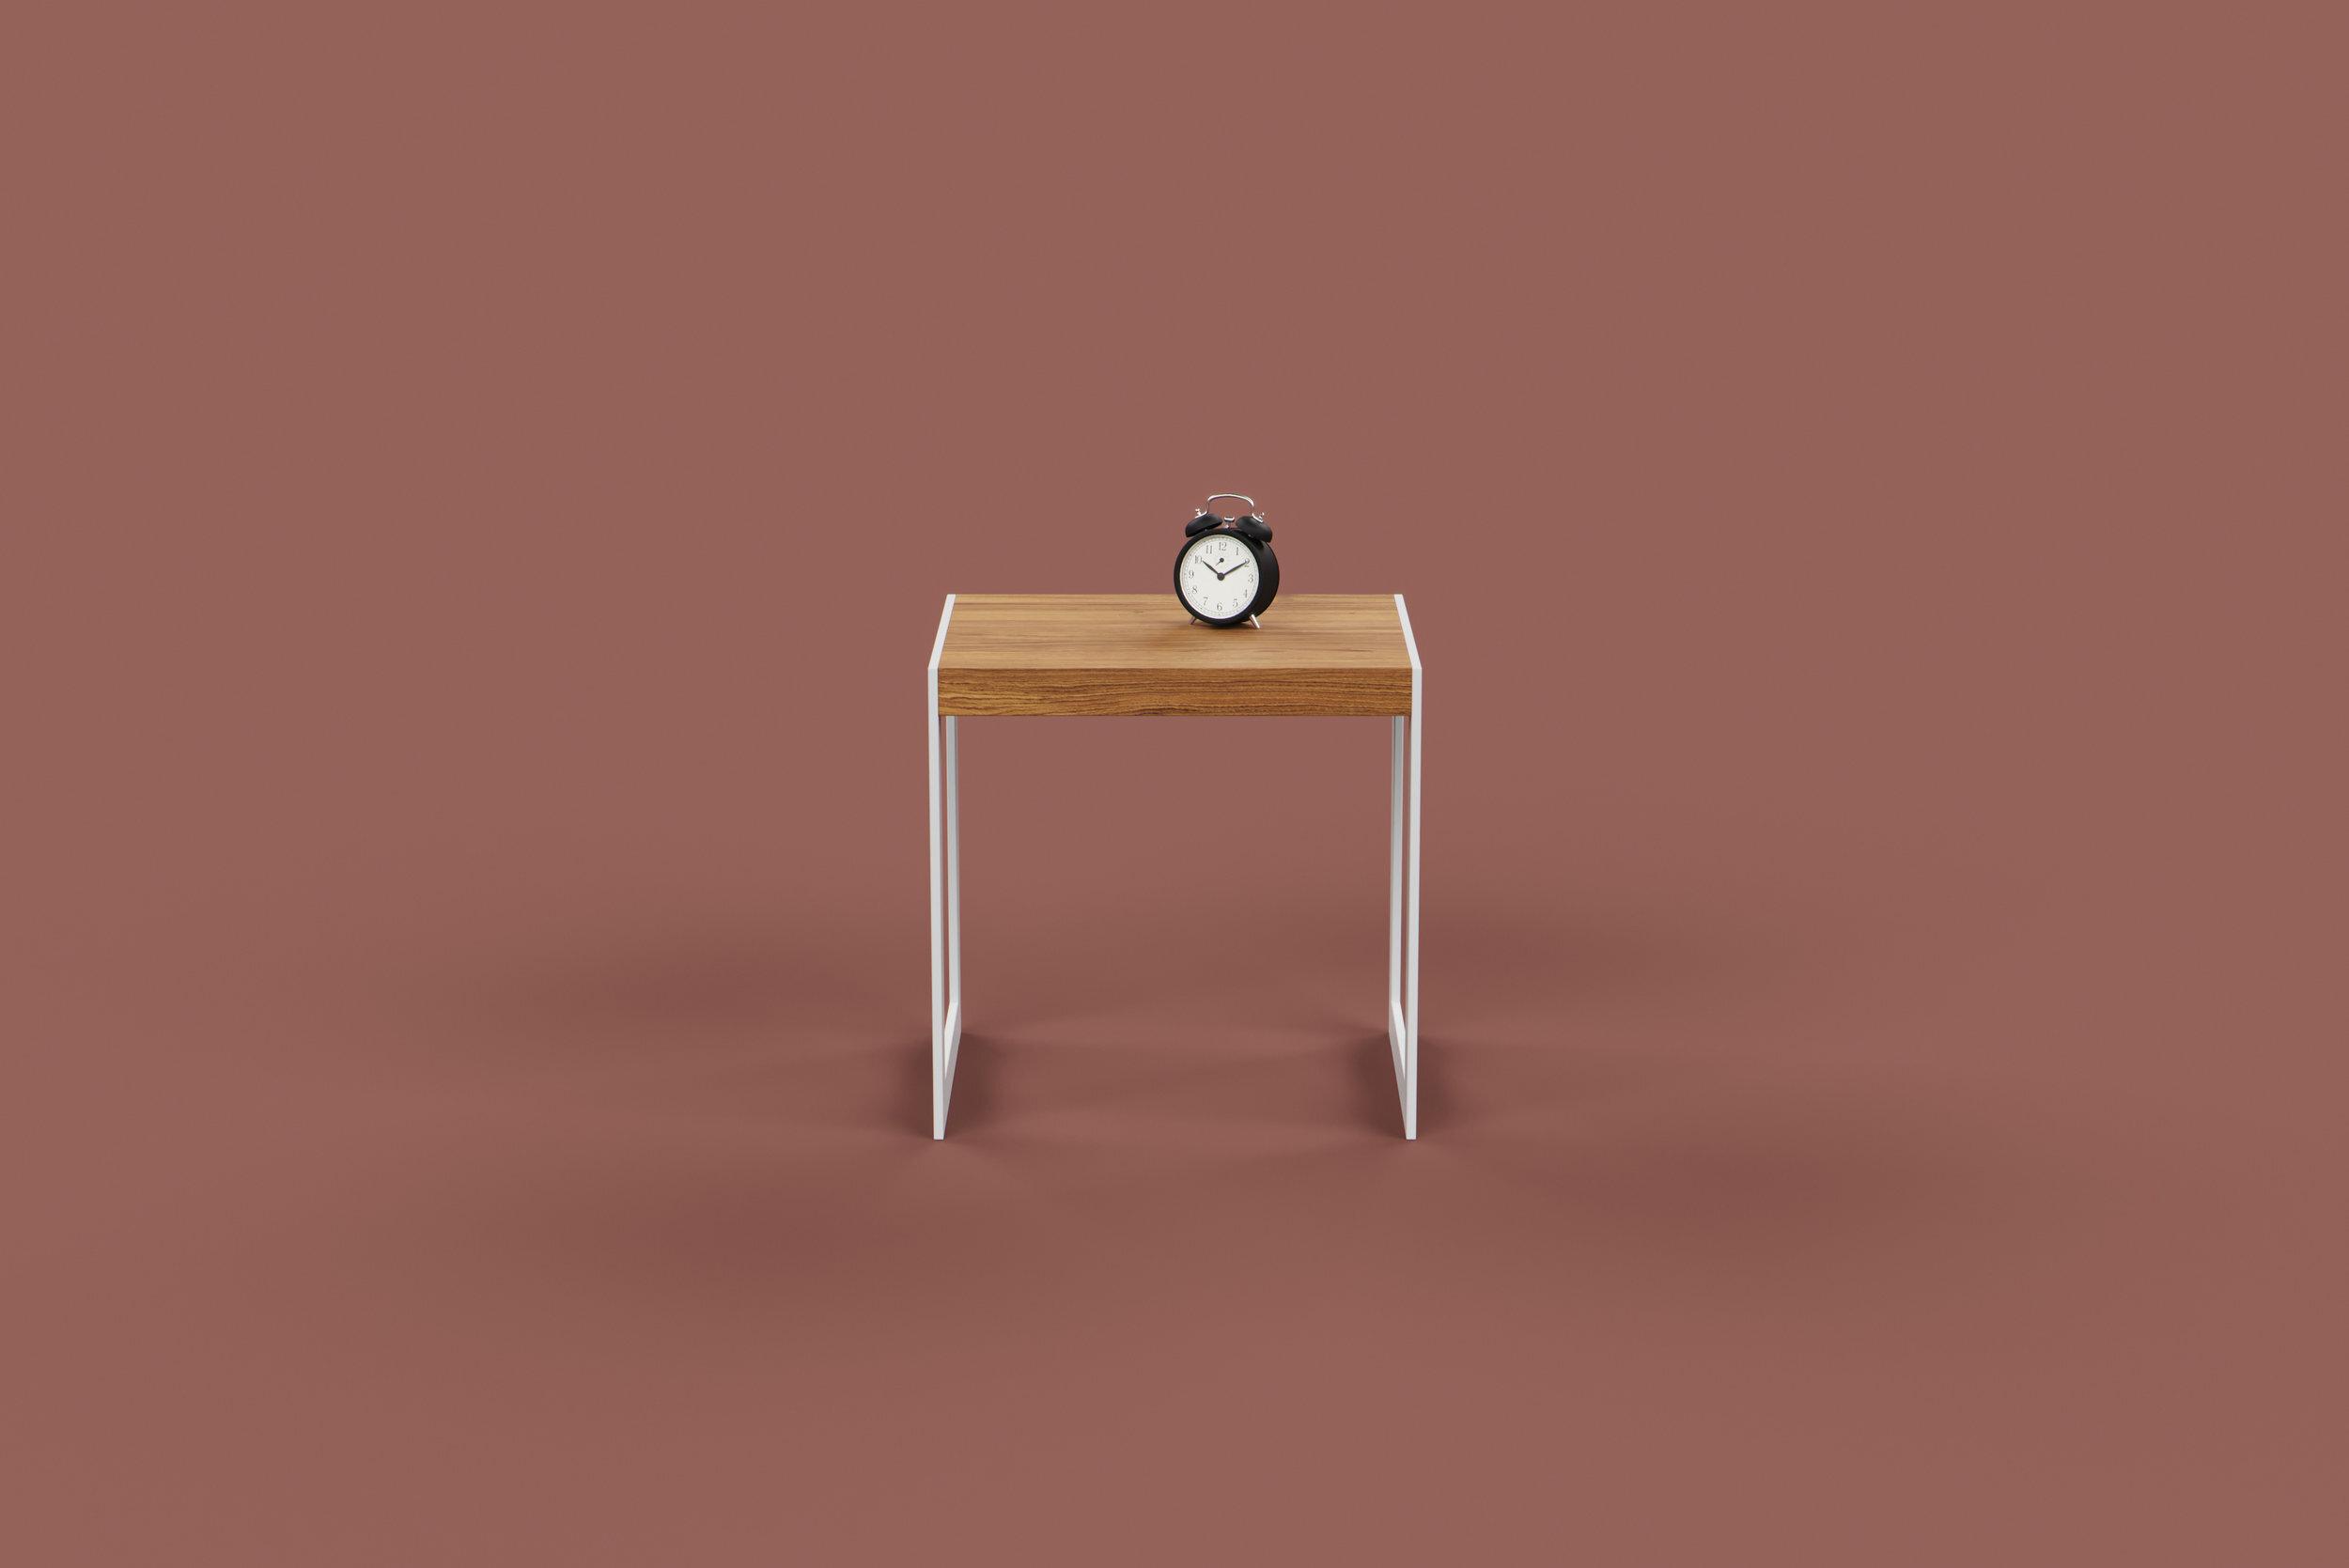 Bedtable 3D visualisation